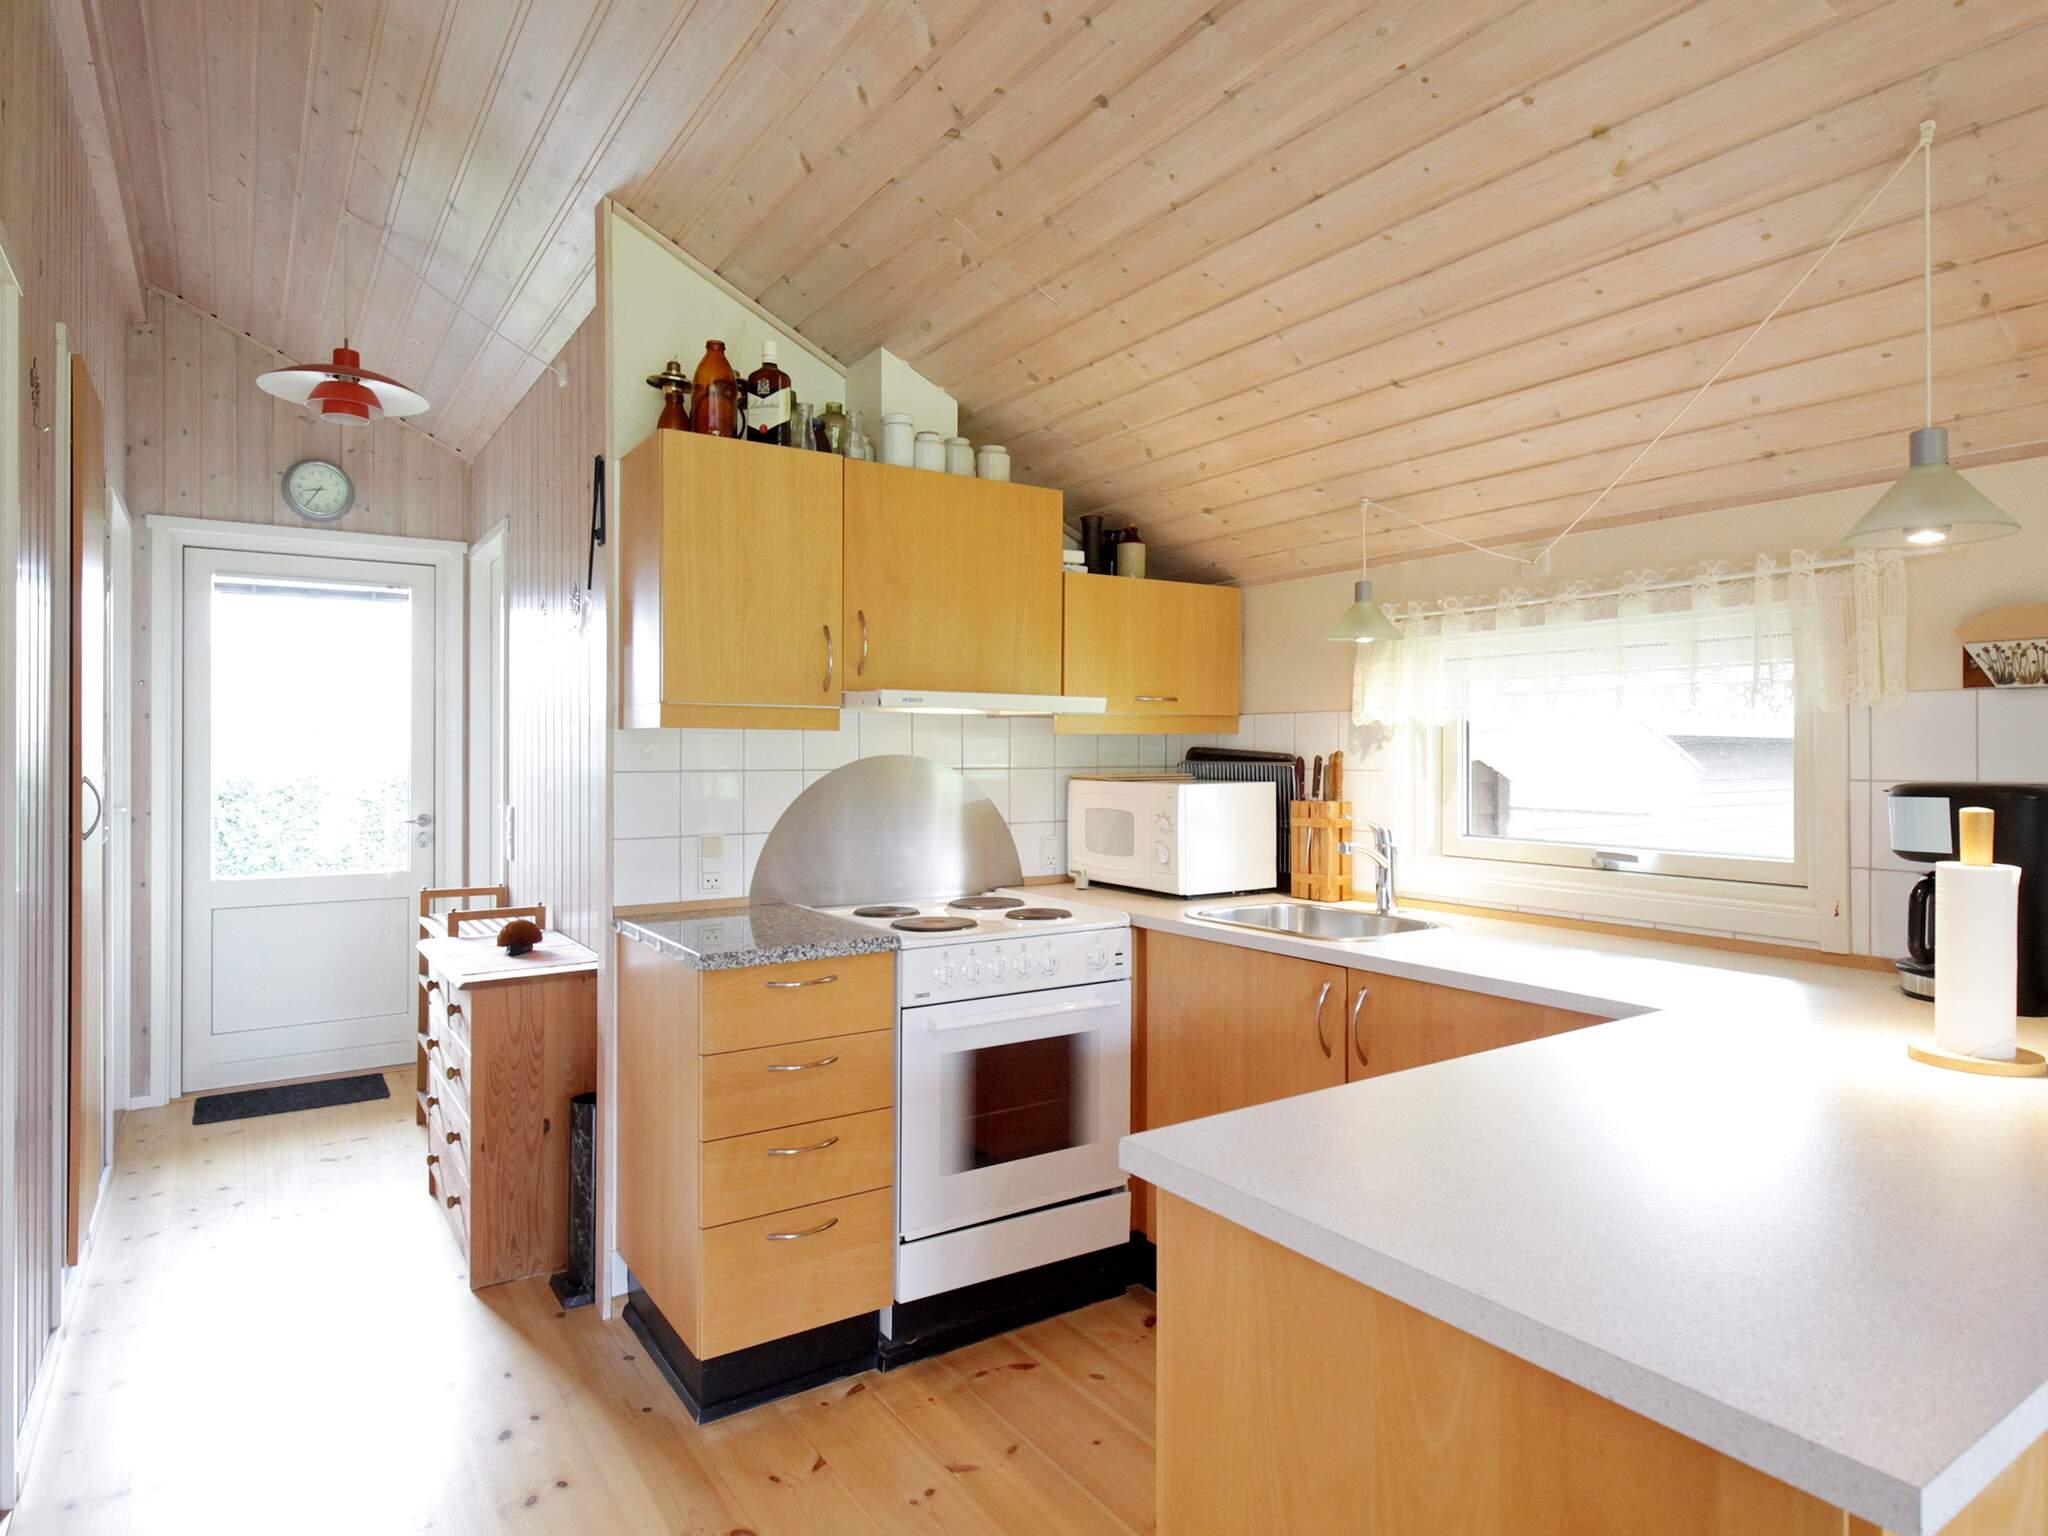 Ferienhaus Hyllingeriis (619896), Skibby, , Nordseeland, Dänemark, Bild 7